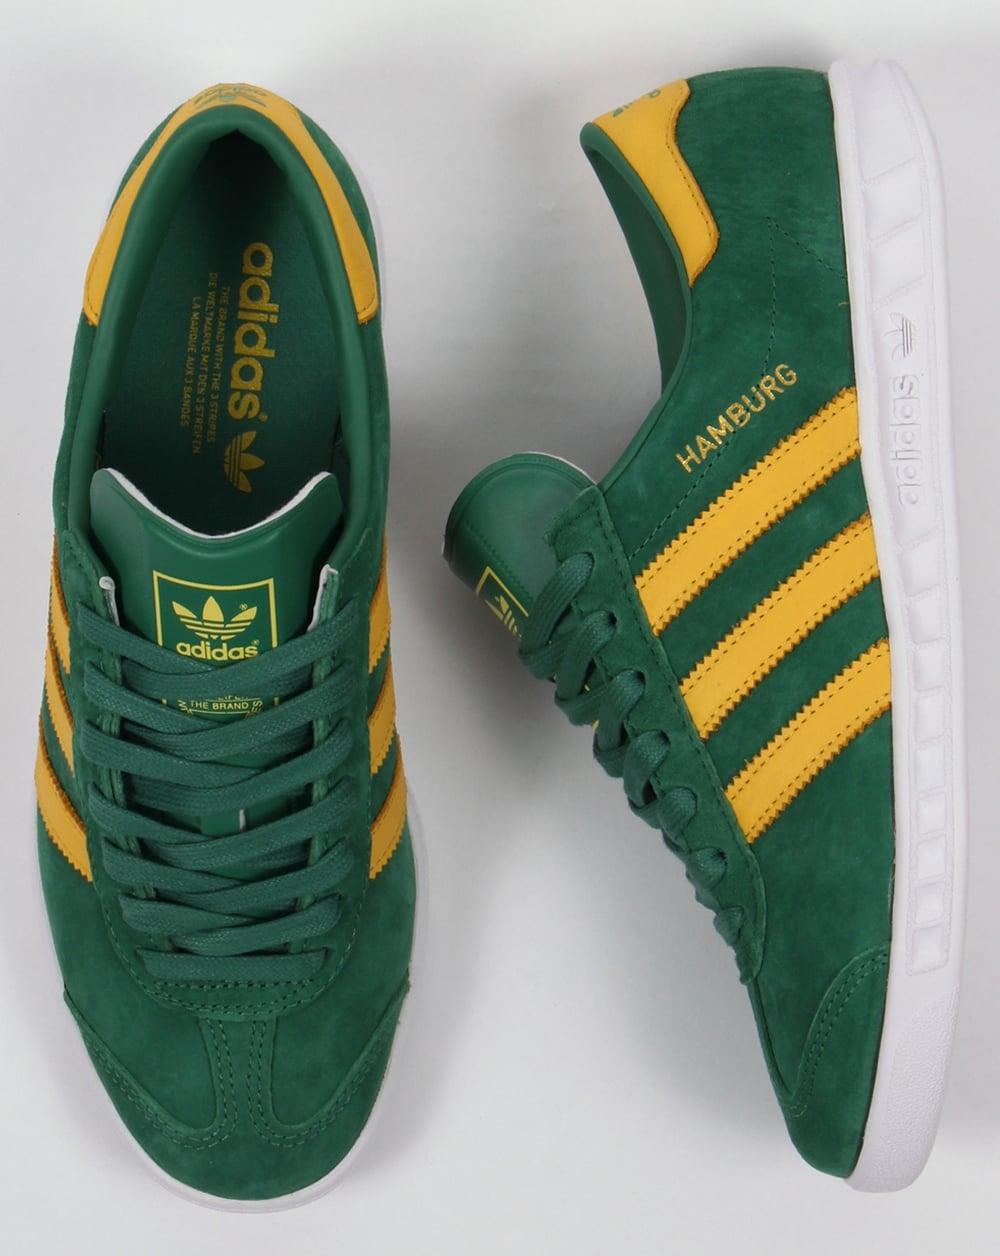 Adidas Hamburg Trainers Green Yellow White e8a56dea3